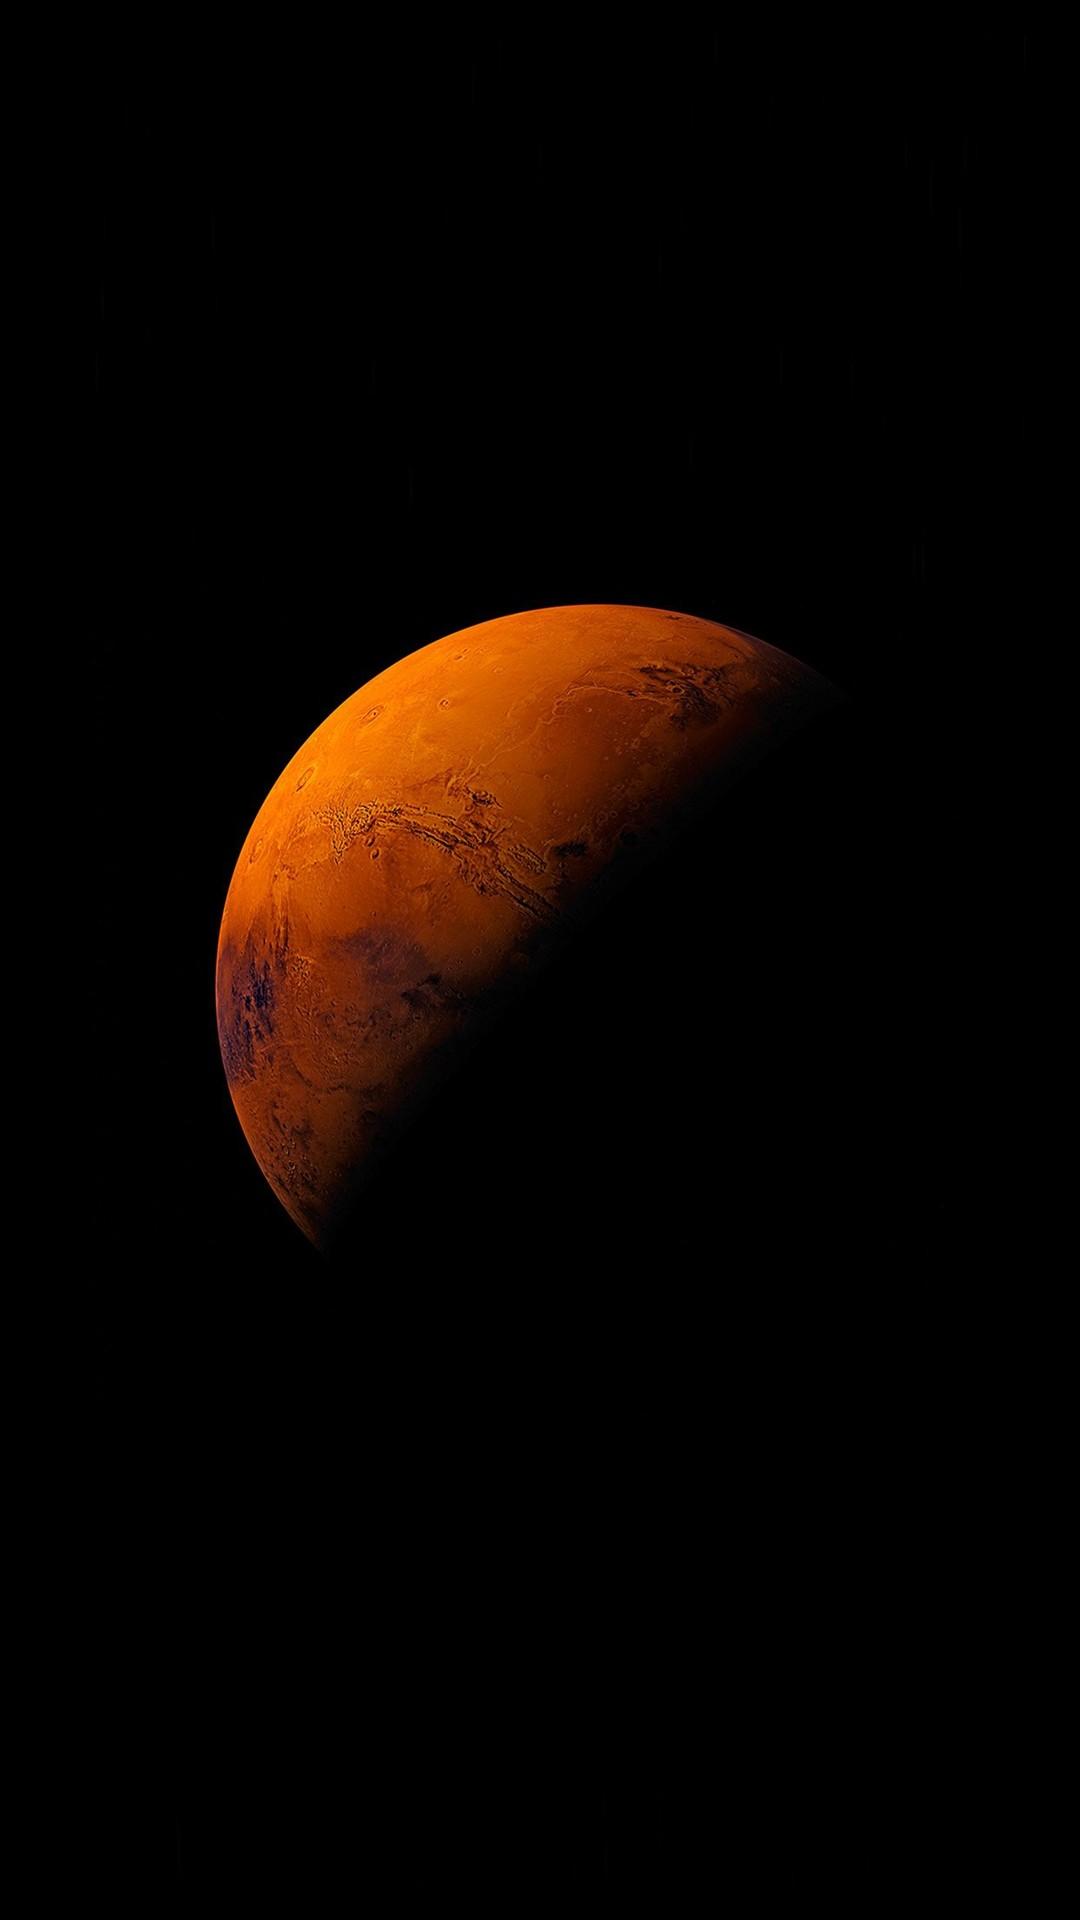 Mars Planet Apple Dark Space Orange iPhone 6 wallpaper